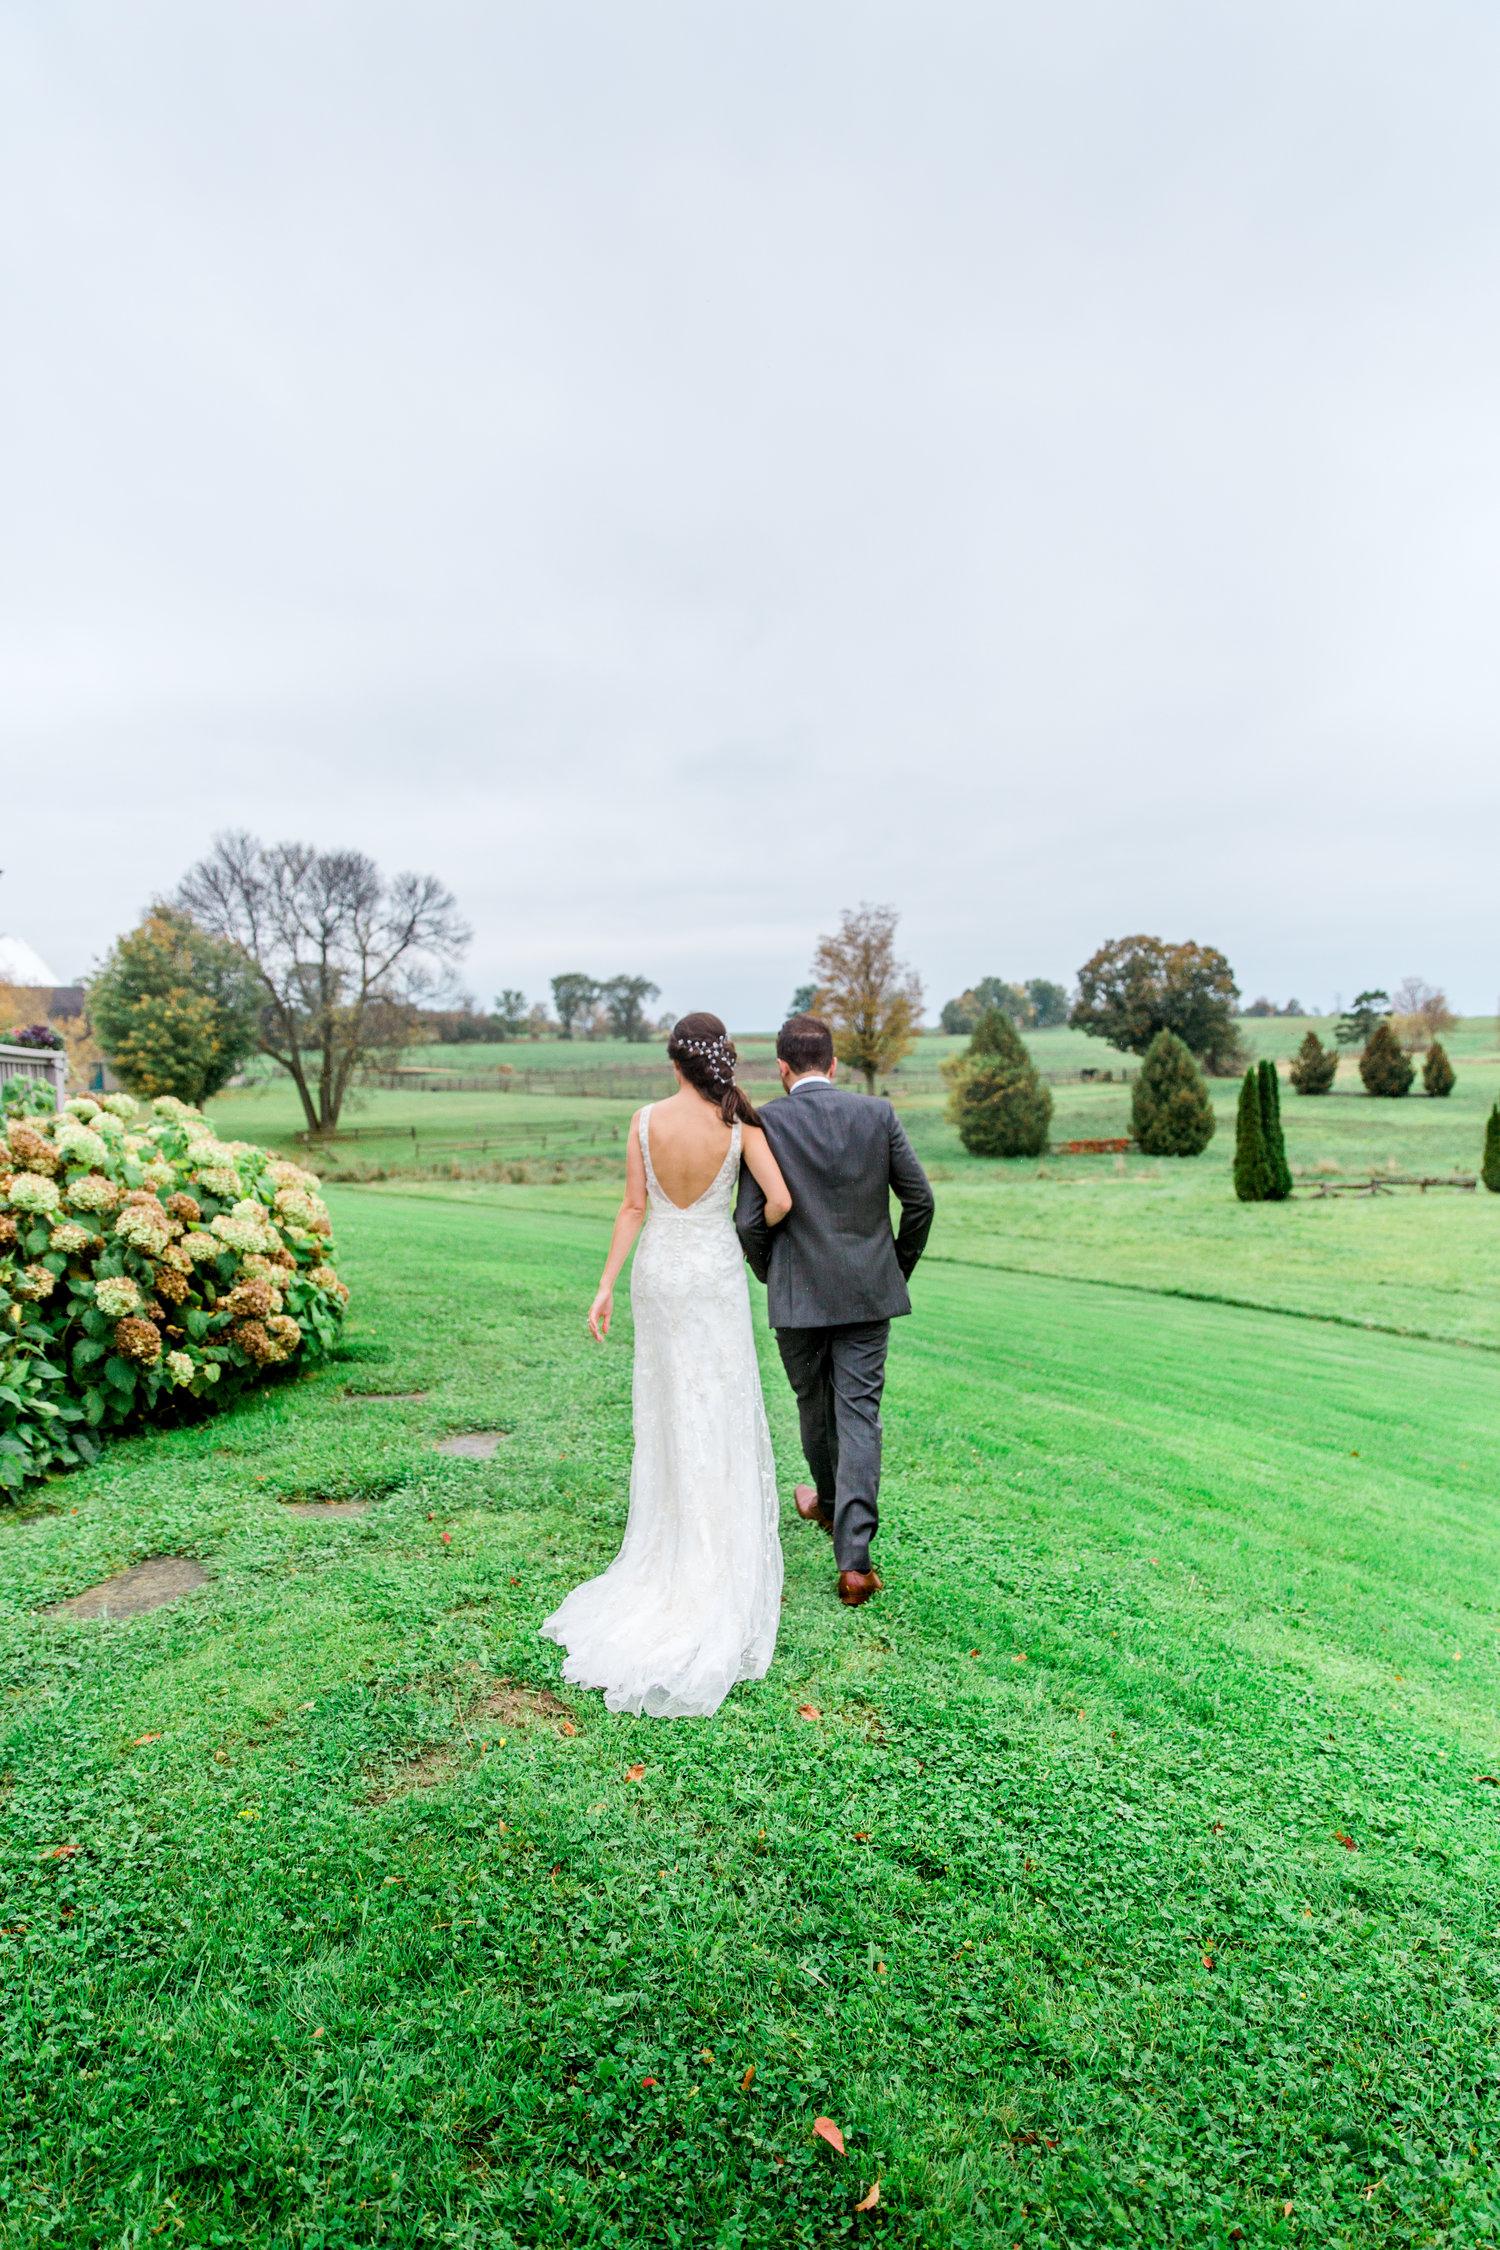 Amir-Golbazi-Danielle-Giroux-Photography_Toronto-Wedding_Cedarwood_Rachel-Paul_448.jpg